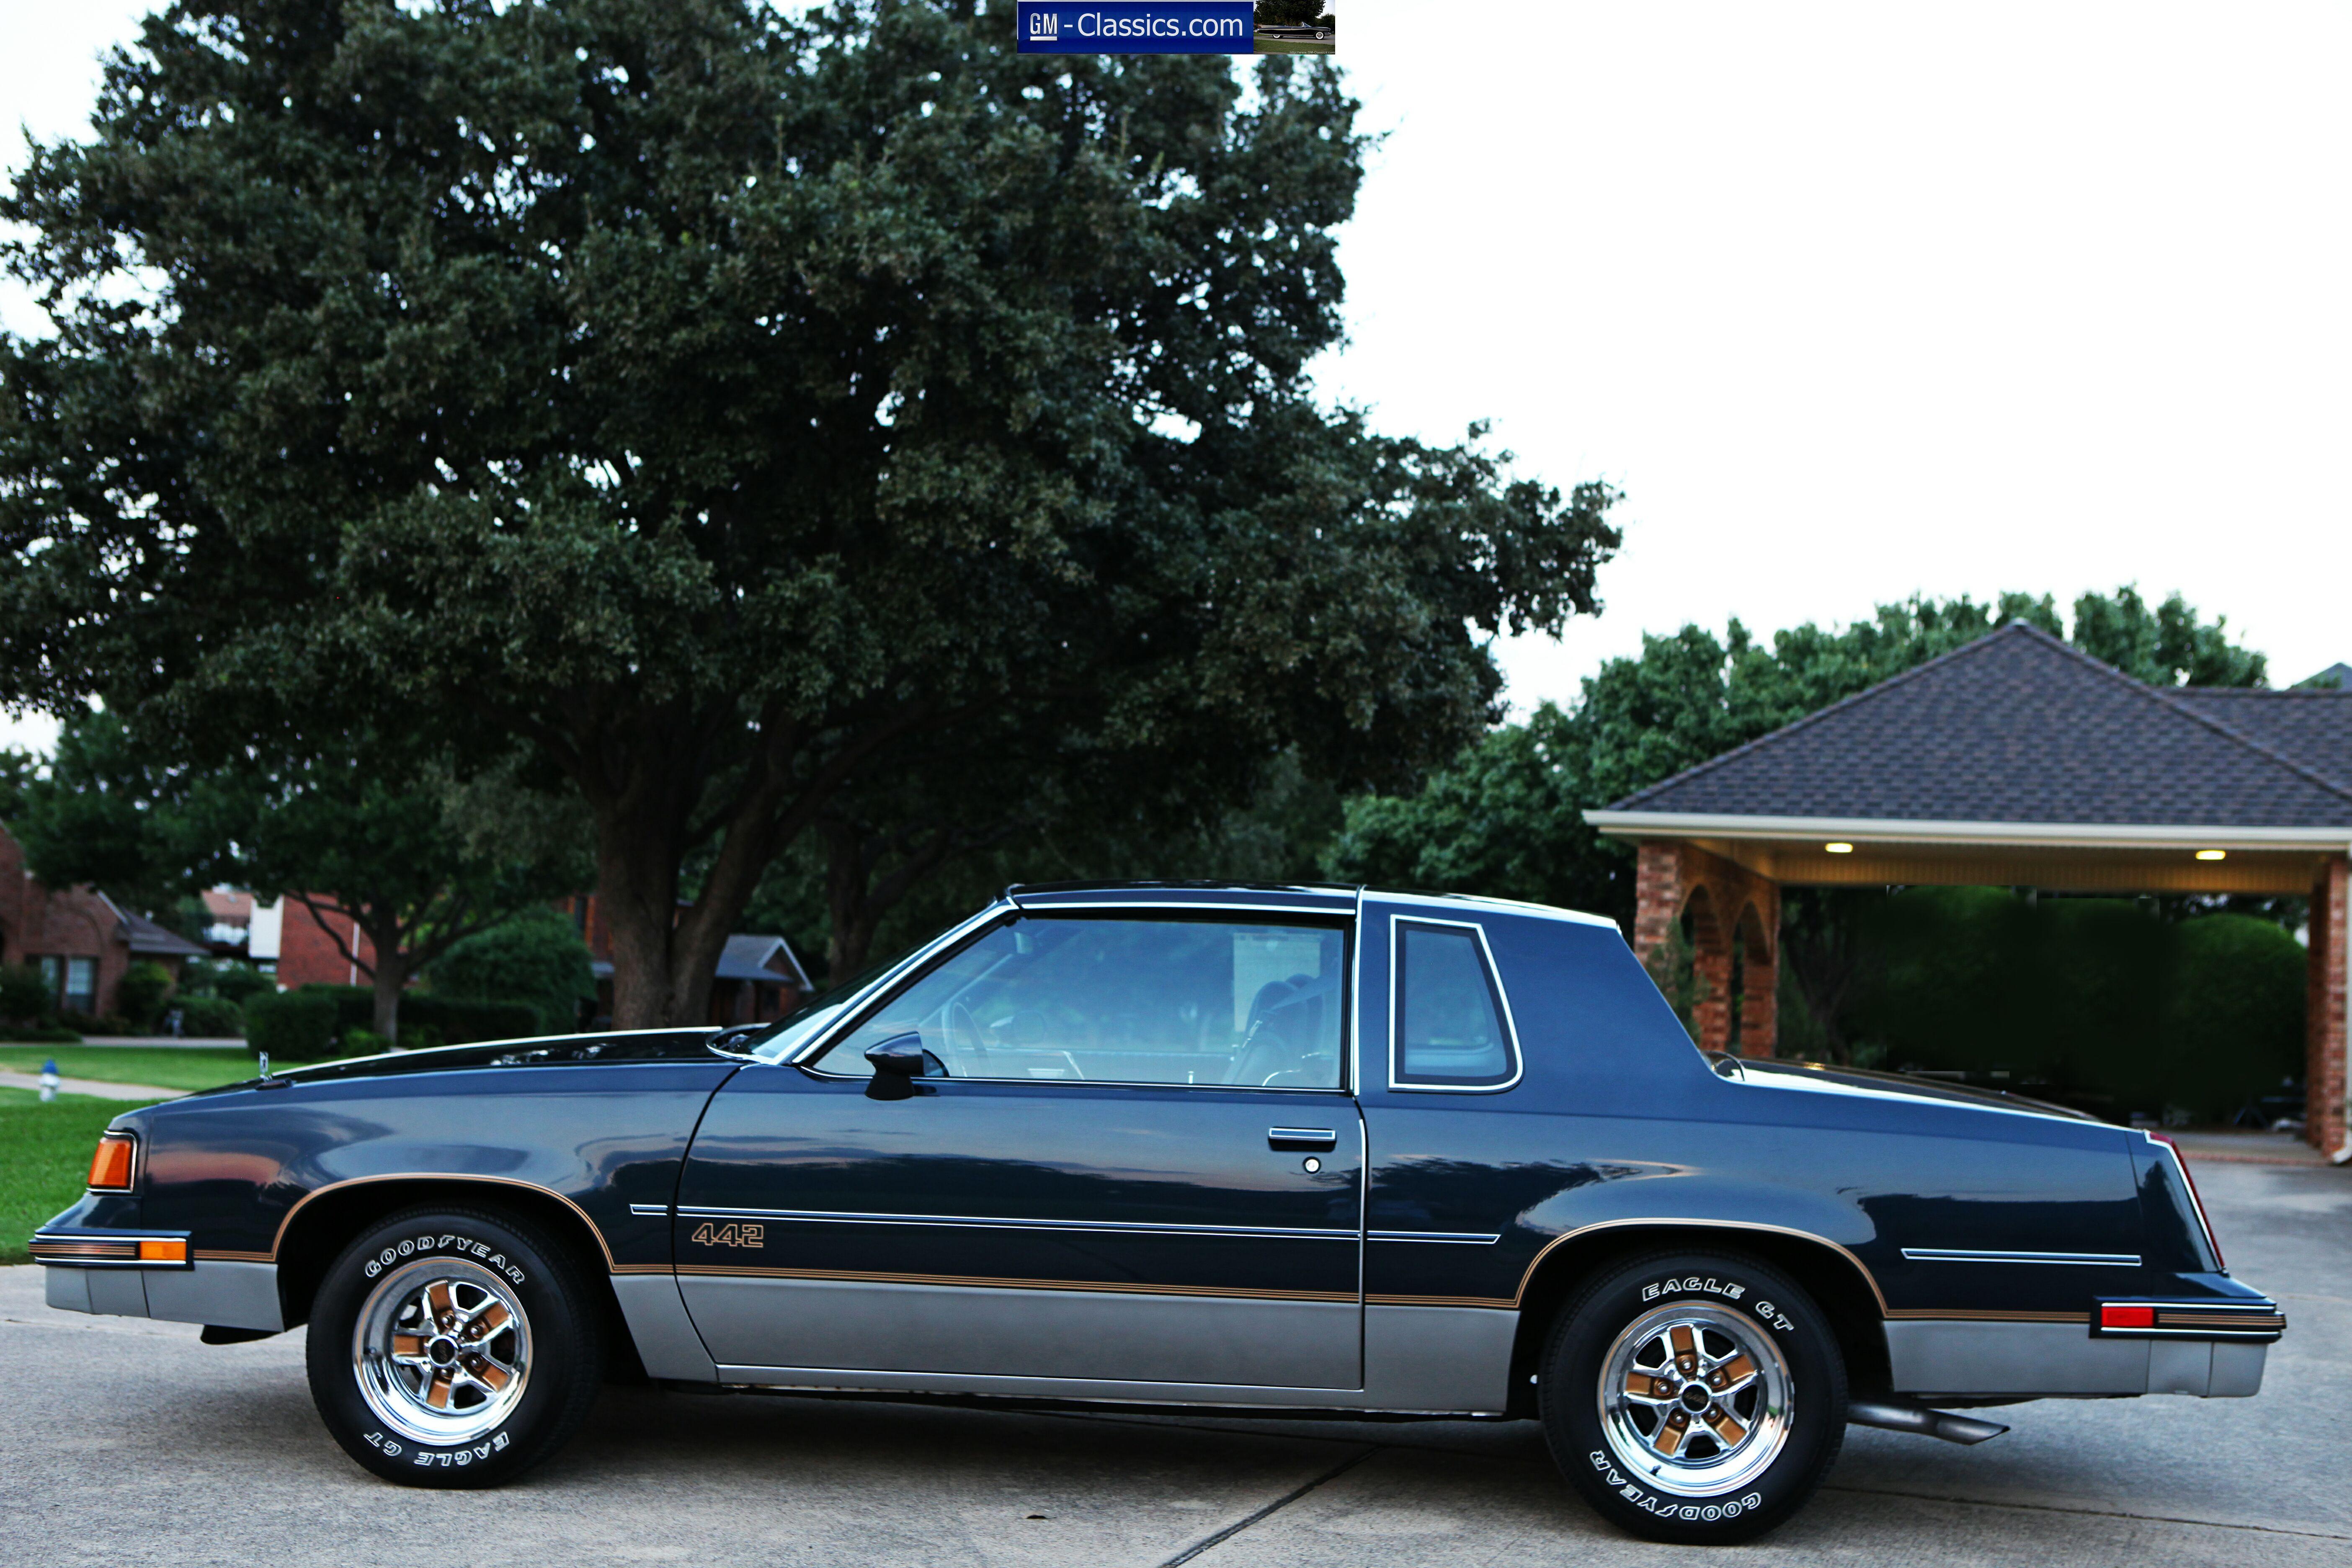 1987 oldsmobile 442 gm classics com